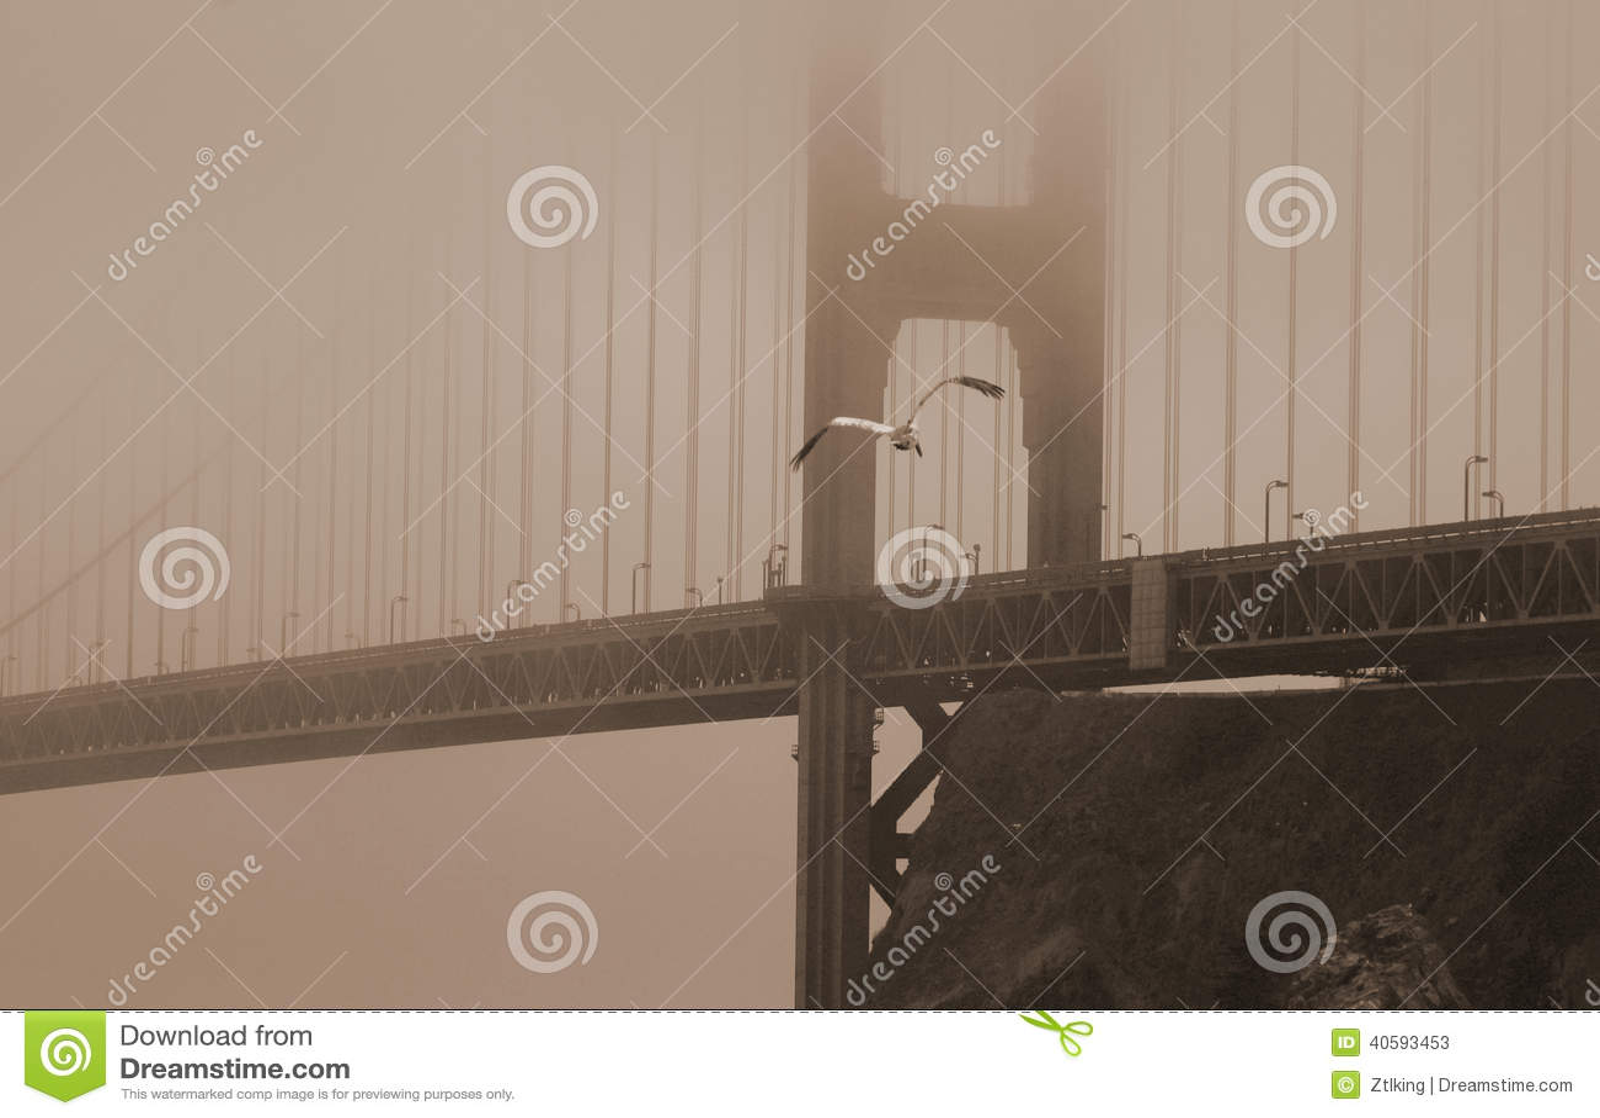 Golden gate bridge in heavy fog